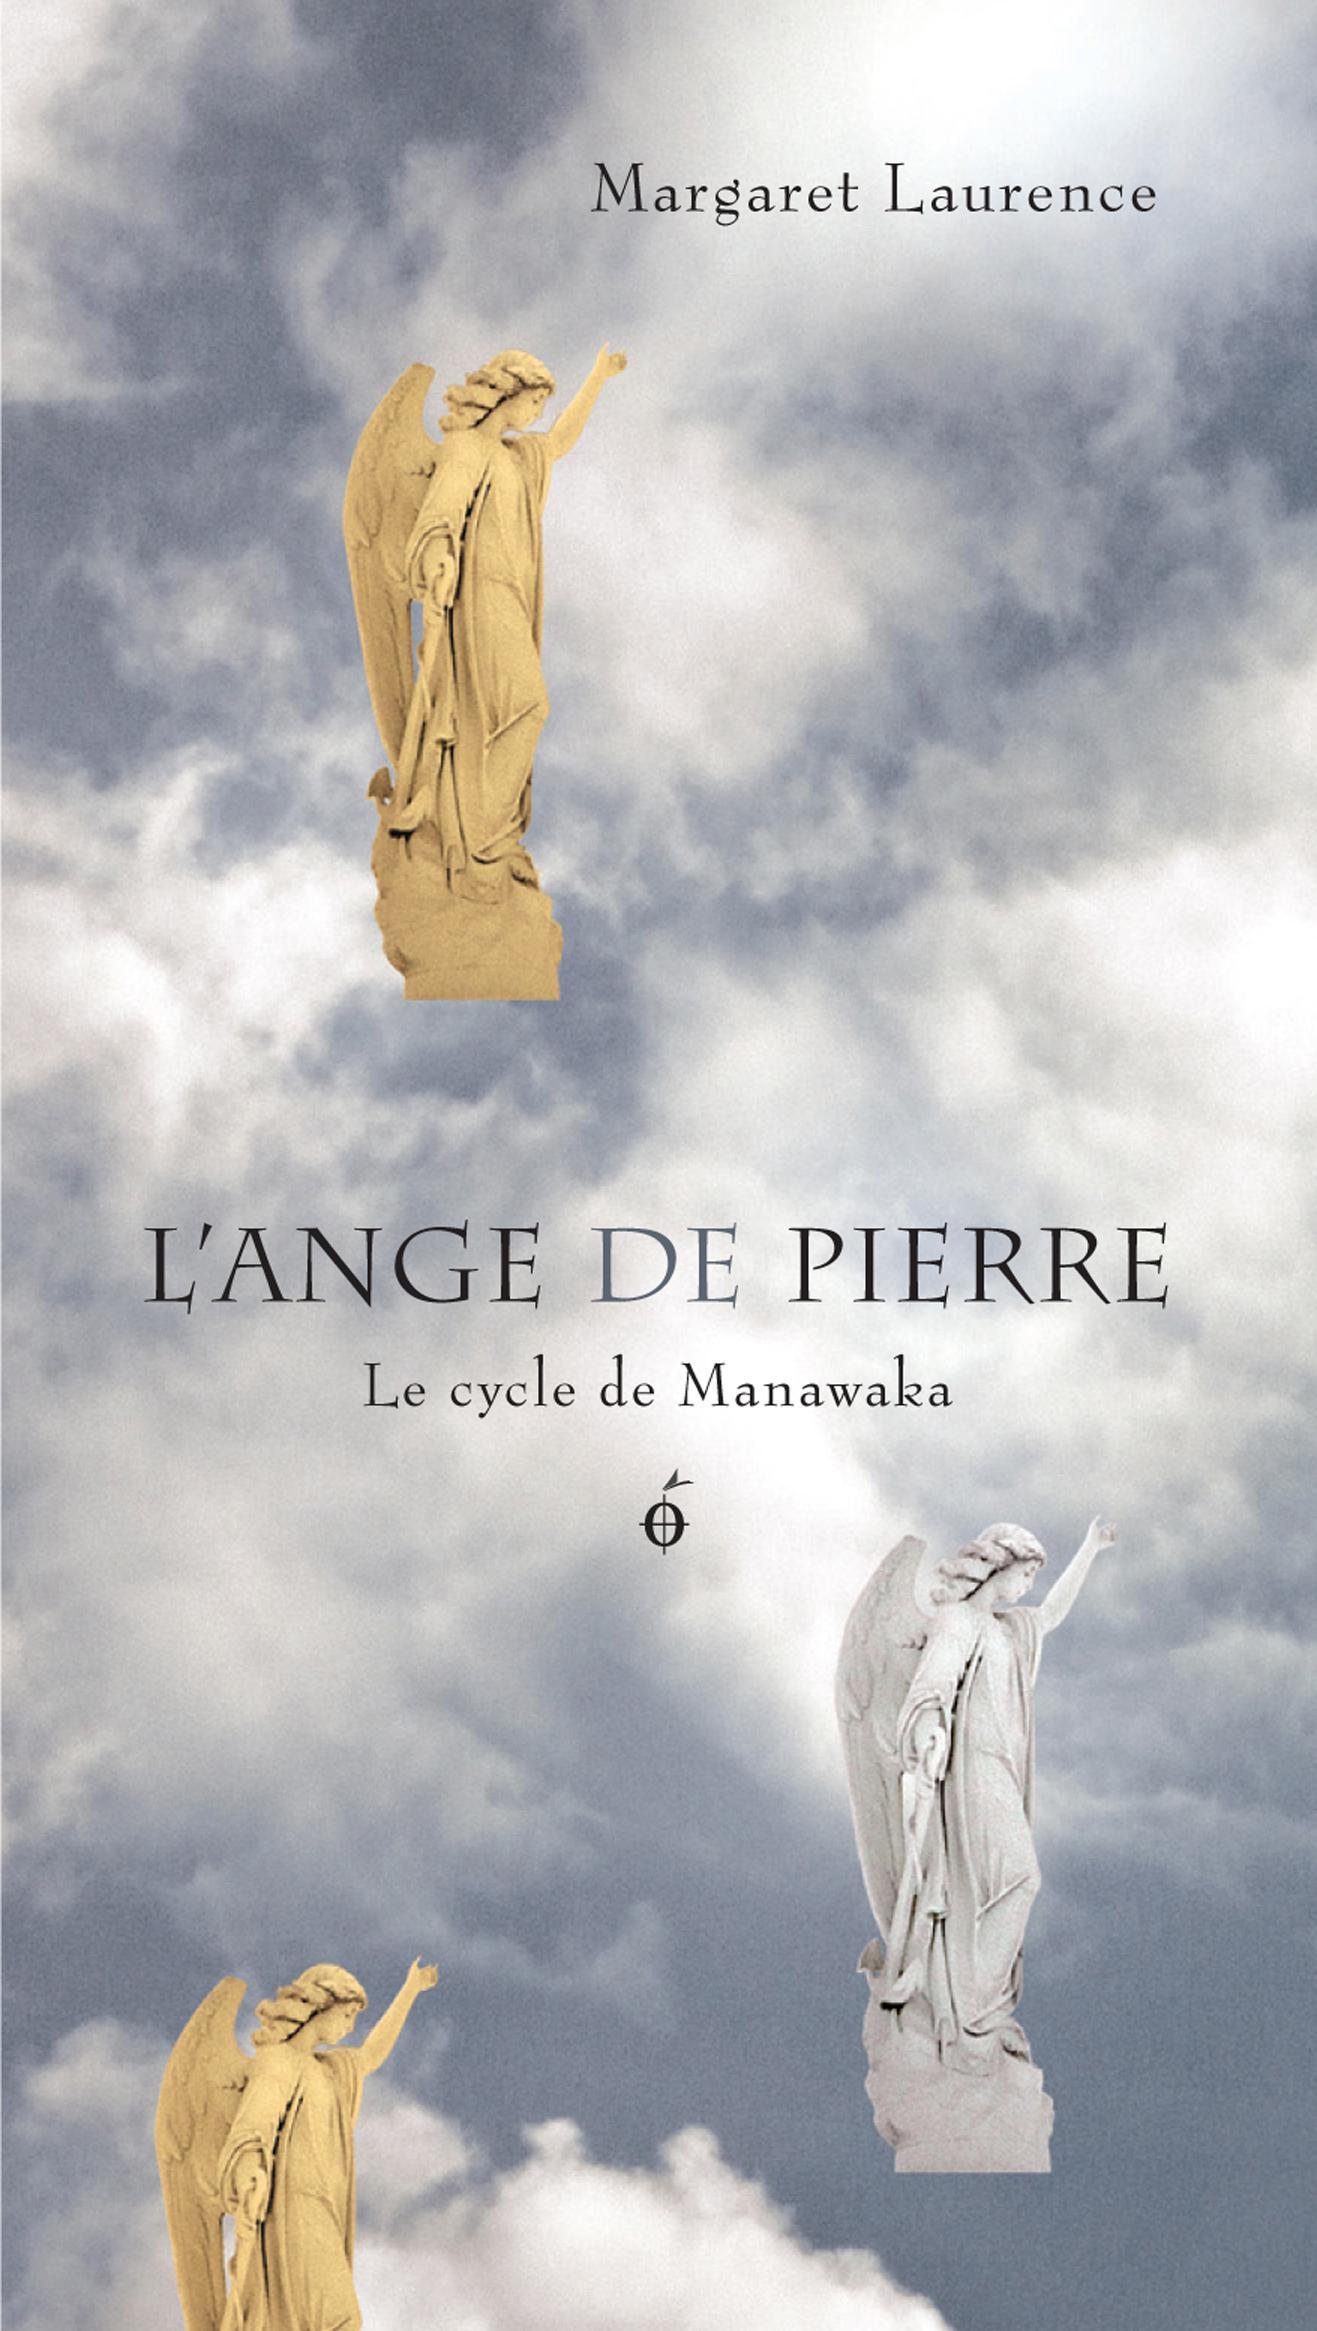 Ange de pierre (L') : Le cycle de Manawaka